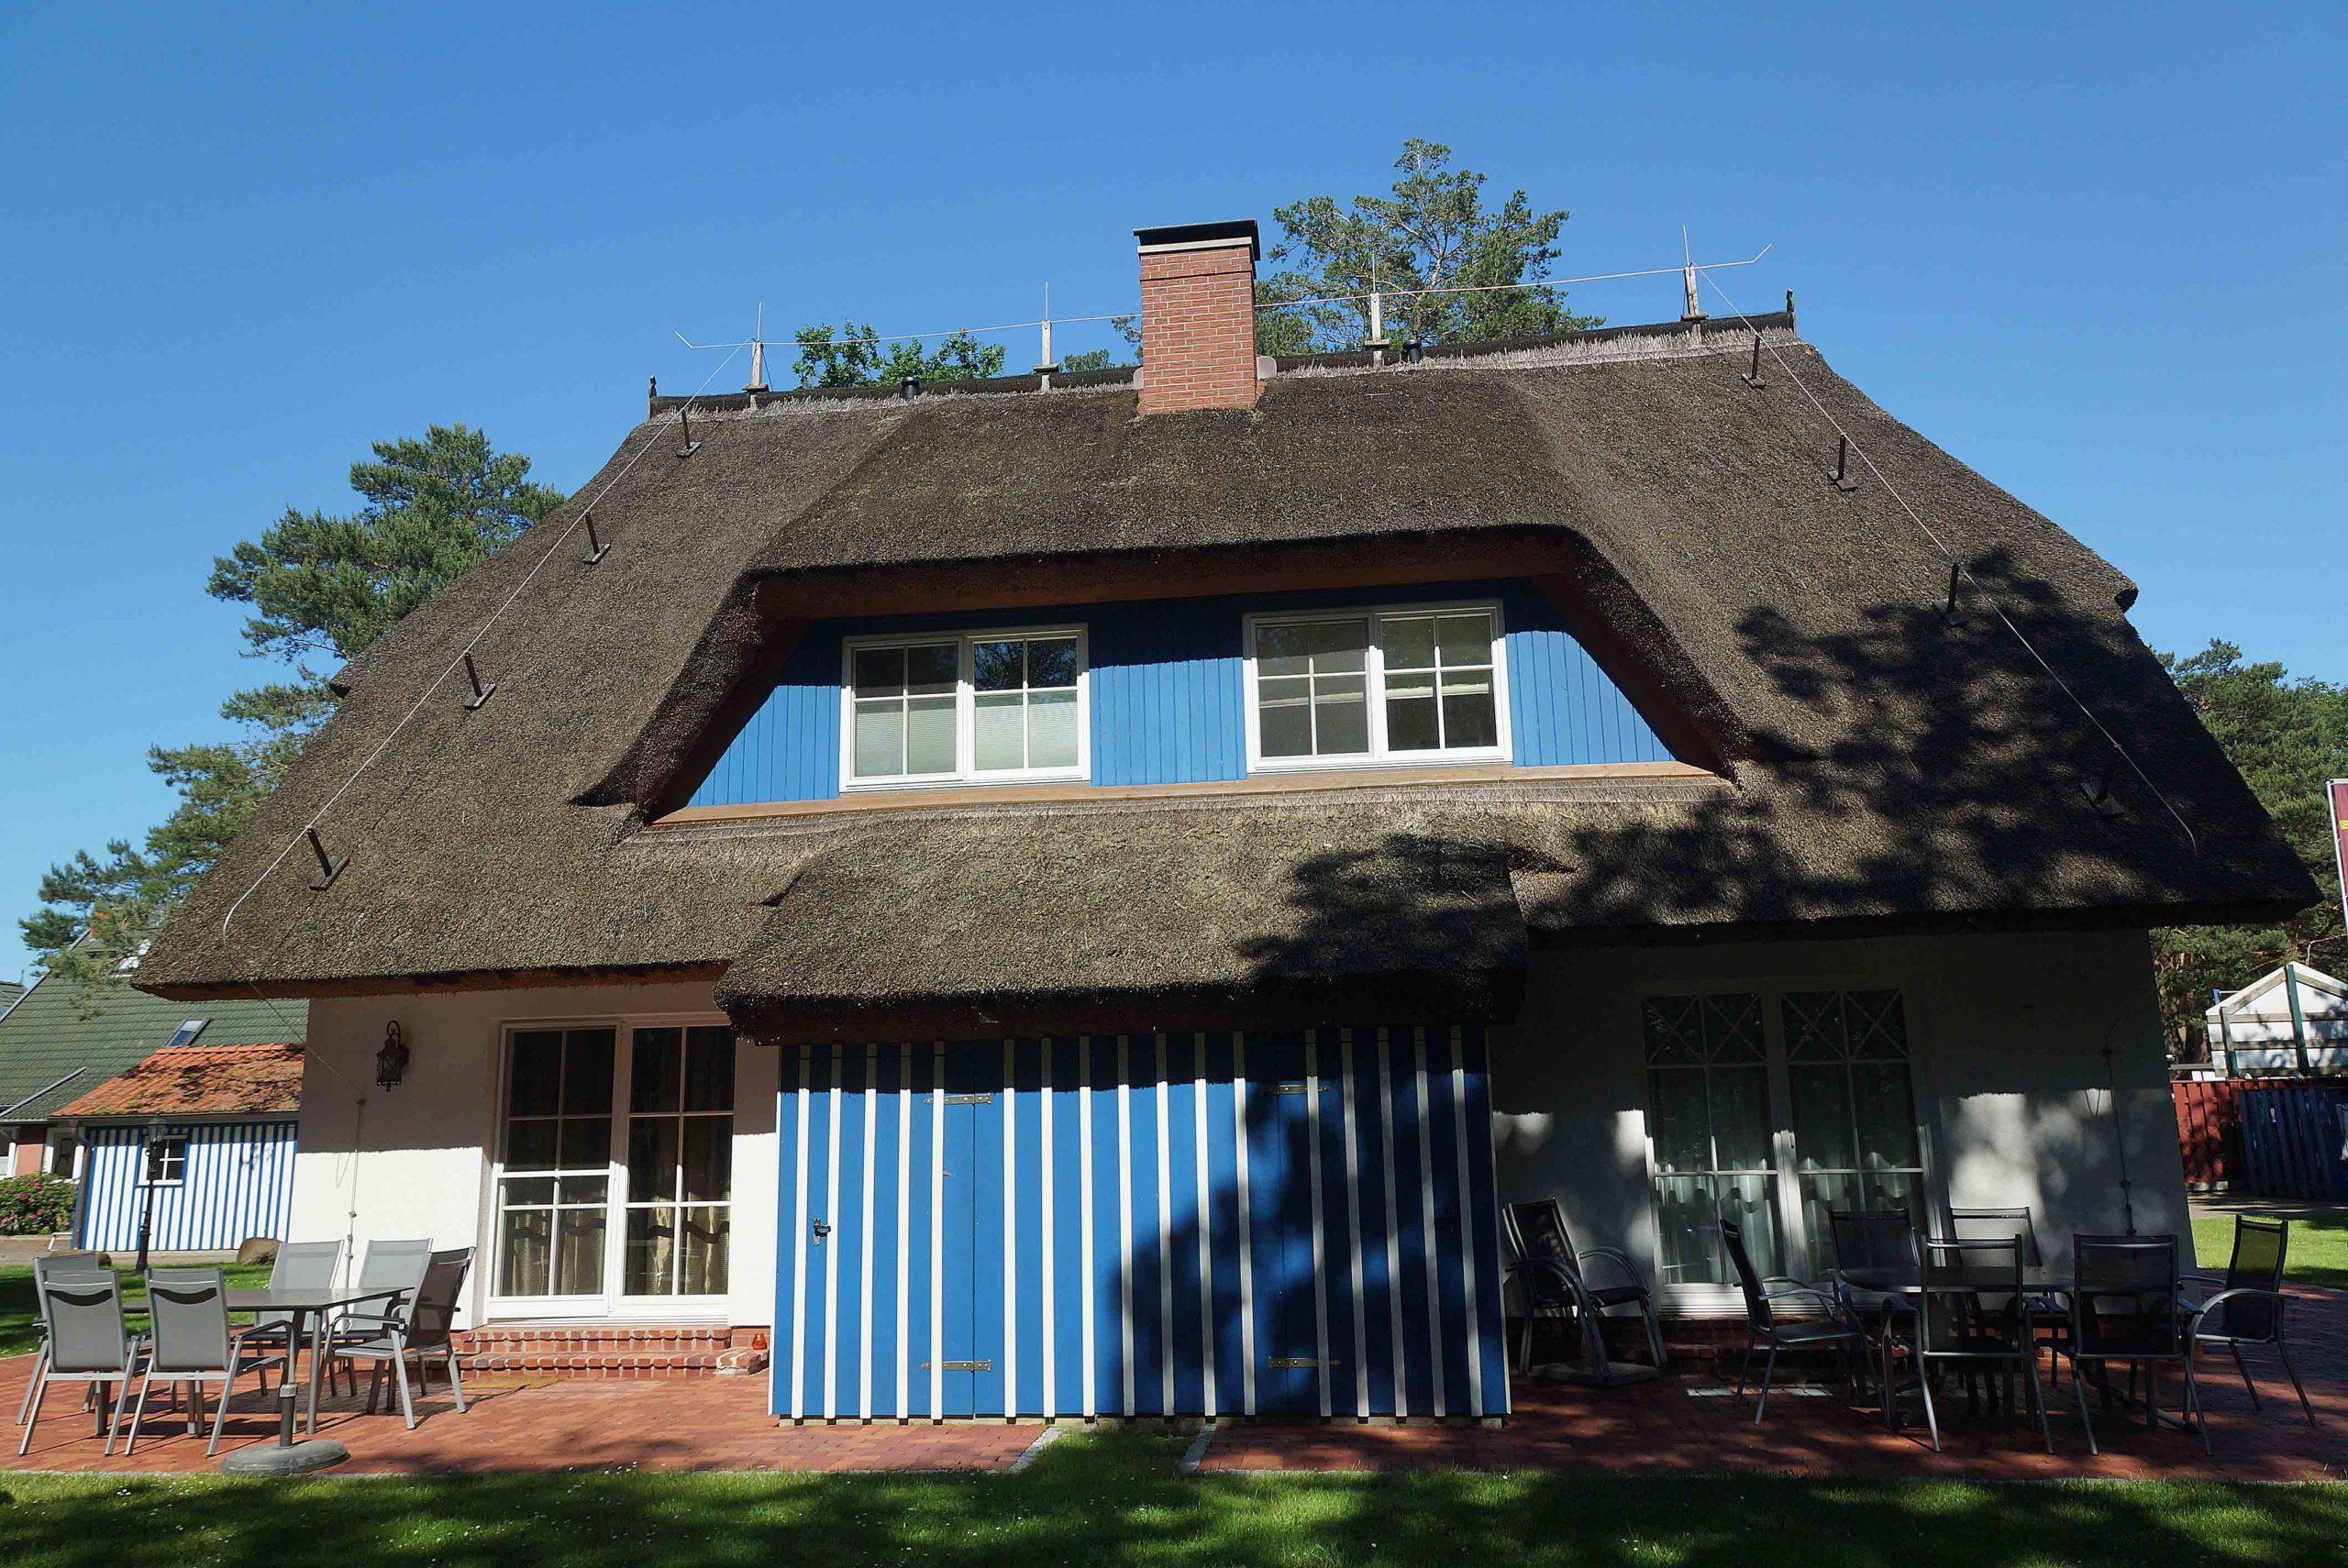 Prerow Ferienhaus Ostsee Oase - Ferienservice Prerow, Hafenstr. 45 18375 Ostseebad Prerow